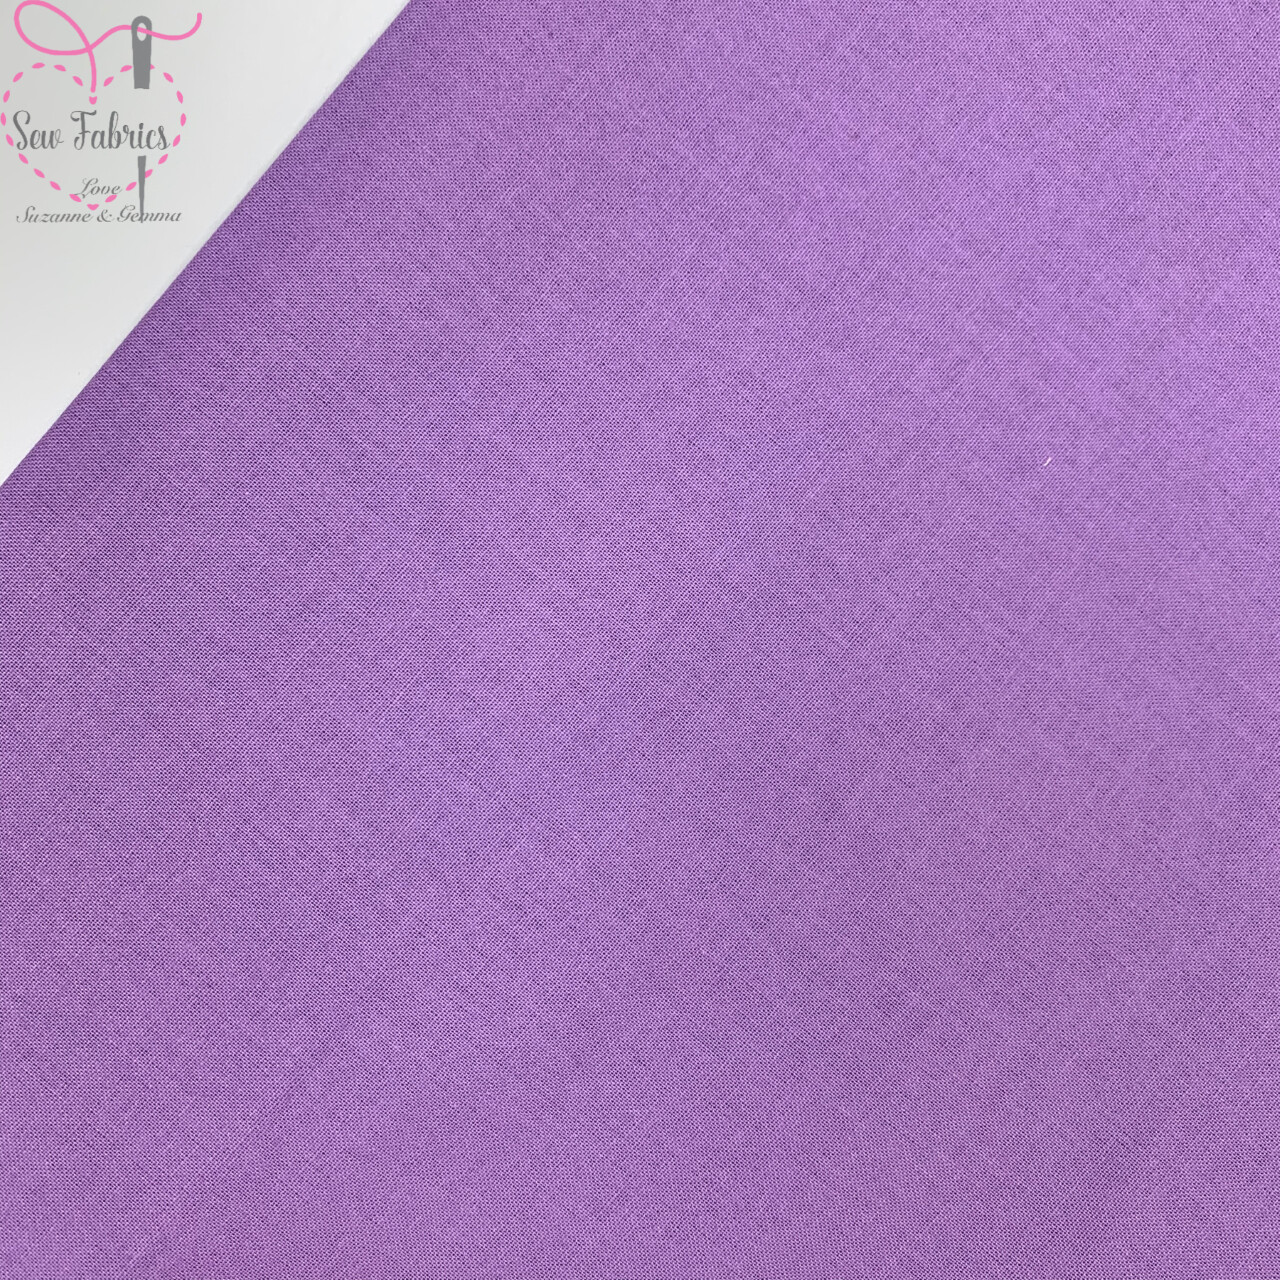 Lavender 100% Craft Cotton Solid Fabric Plain Pale Purple Material